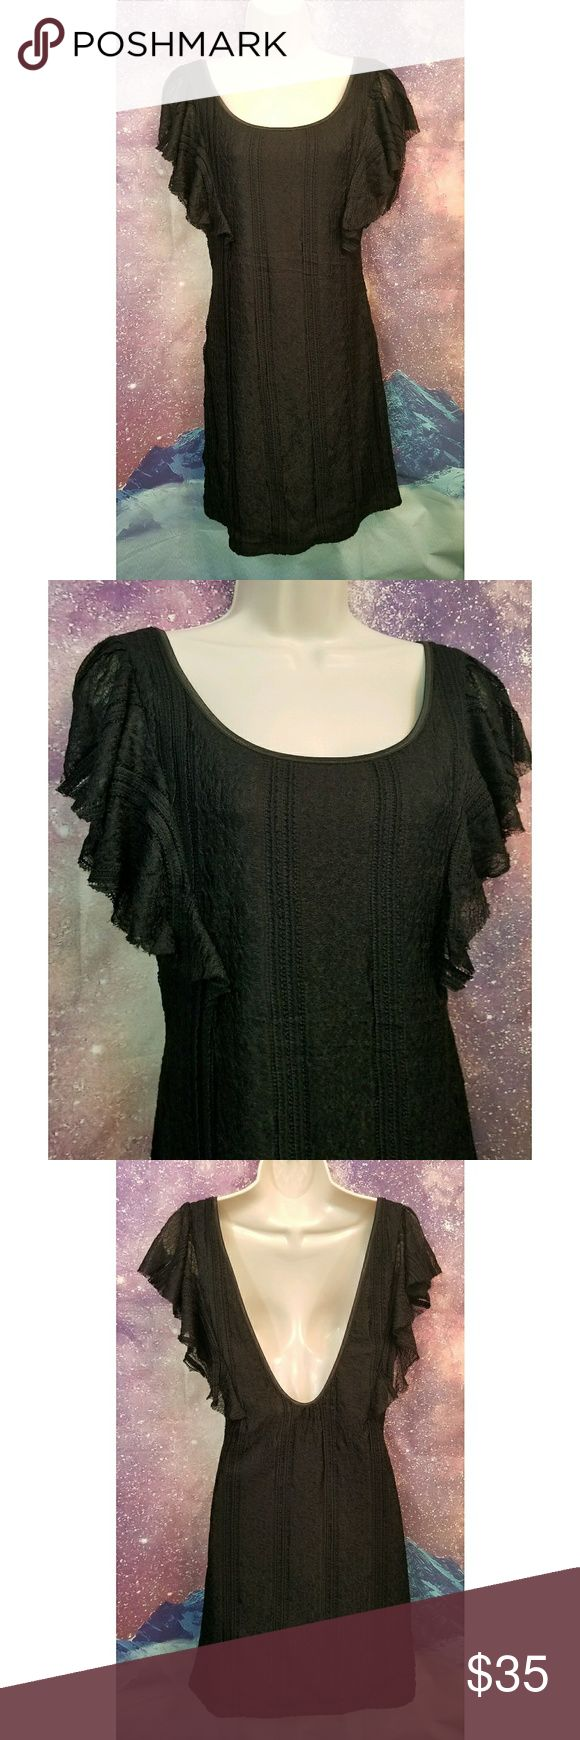 Little Black Lace Dress Gianni Bini NWT $50 Gianni Bini Dress Gianni Bini Dresses Mini